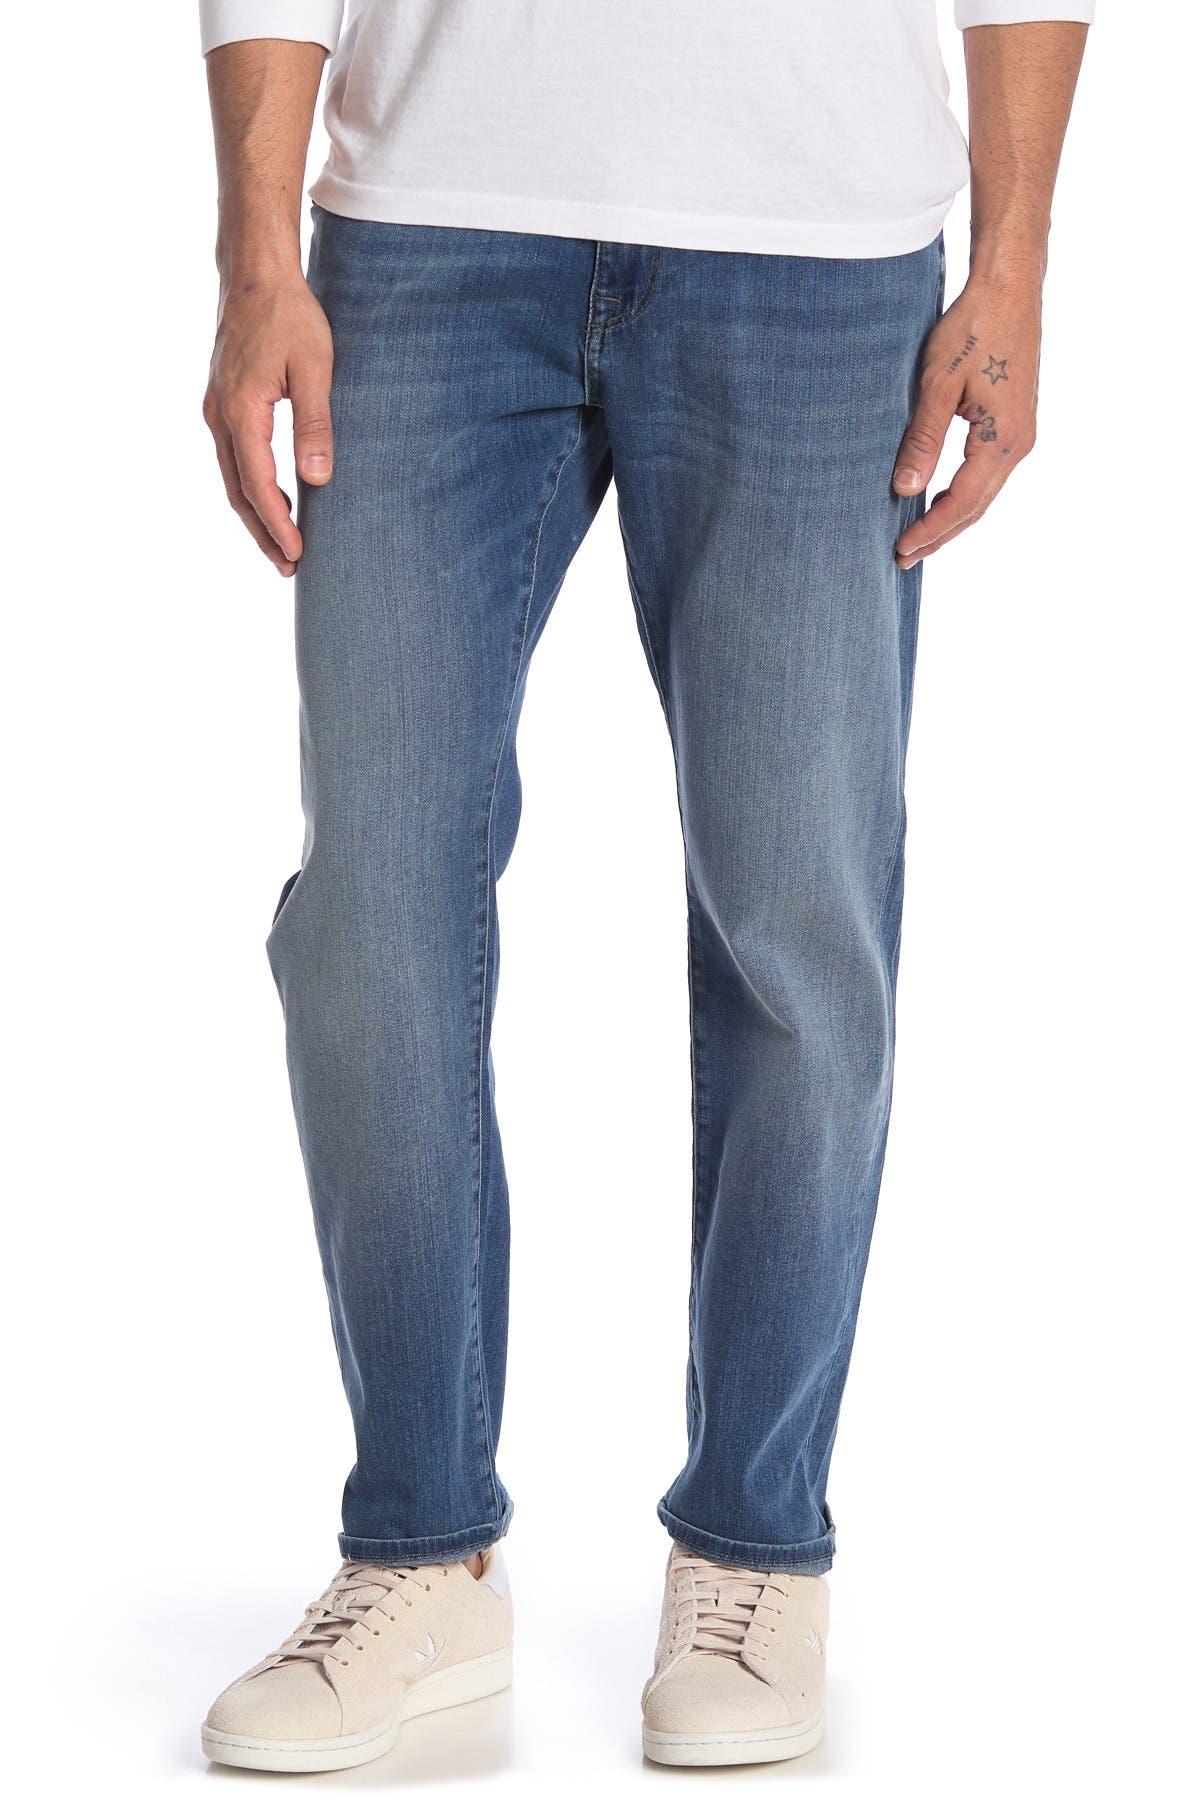 "Image of Mavi Marcus Straight Jeans - 30-34"" Inseam"